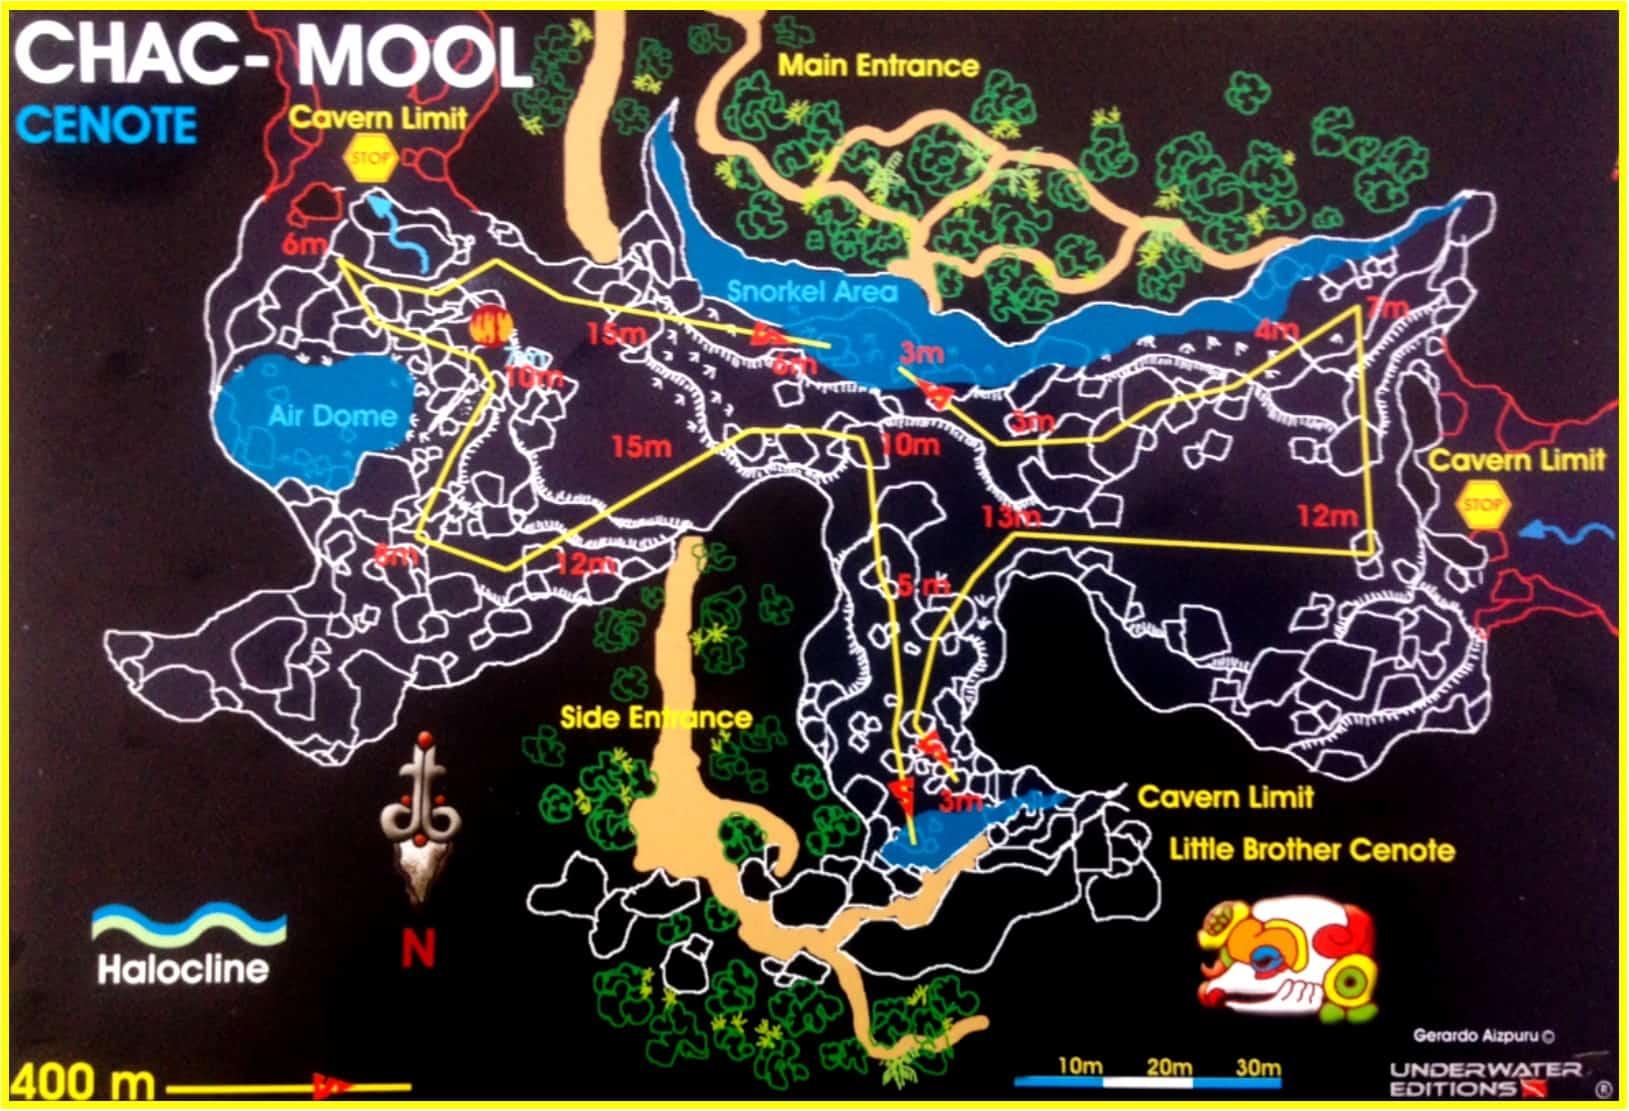 Cenote Chac Mool Pro Dive International